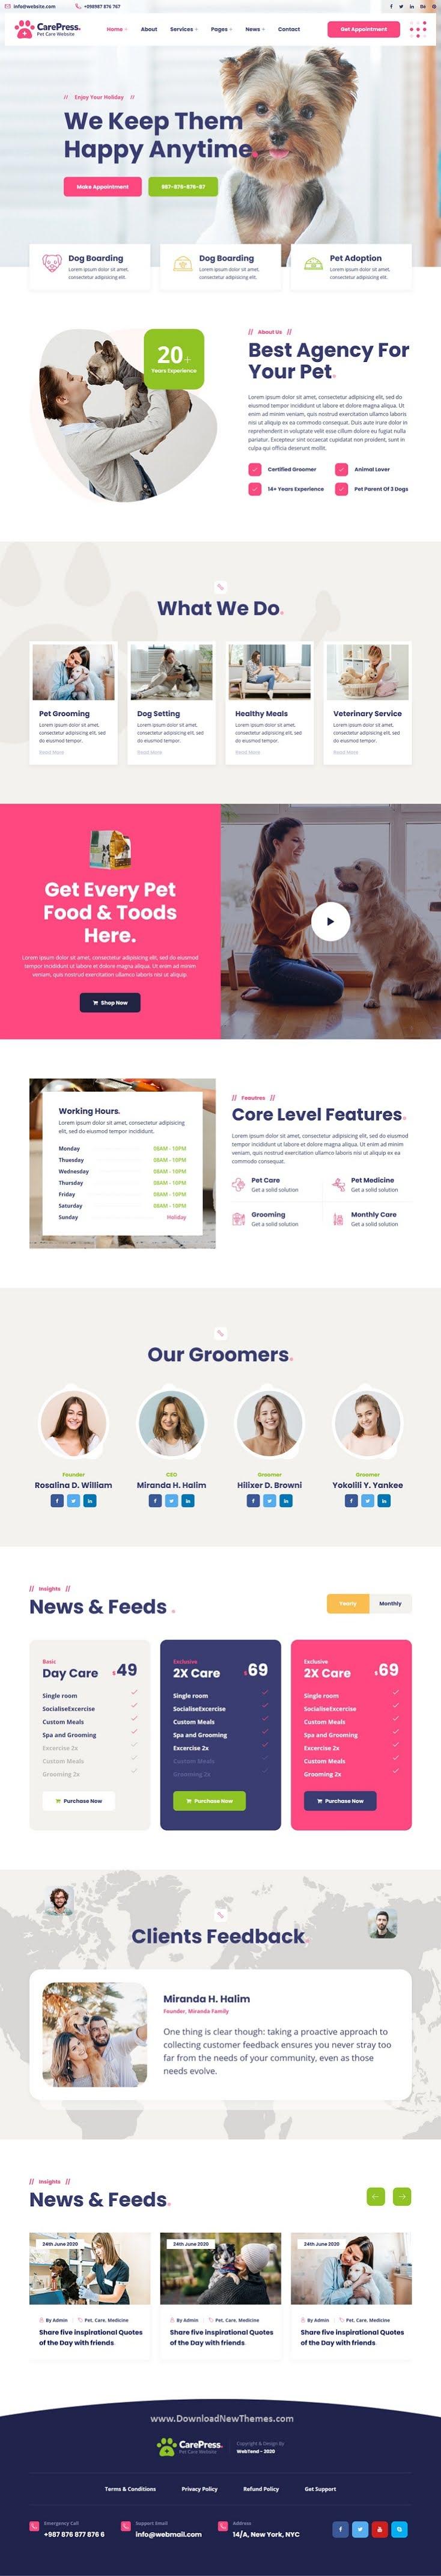 Pet Care & Veterinary Shop HTML Template